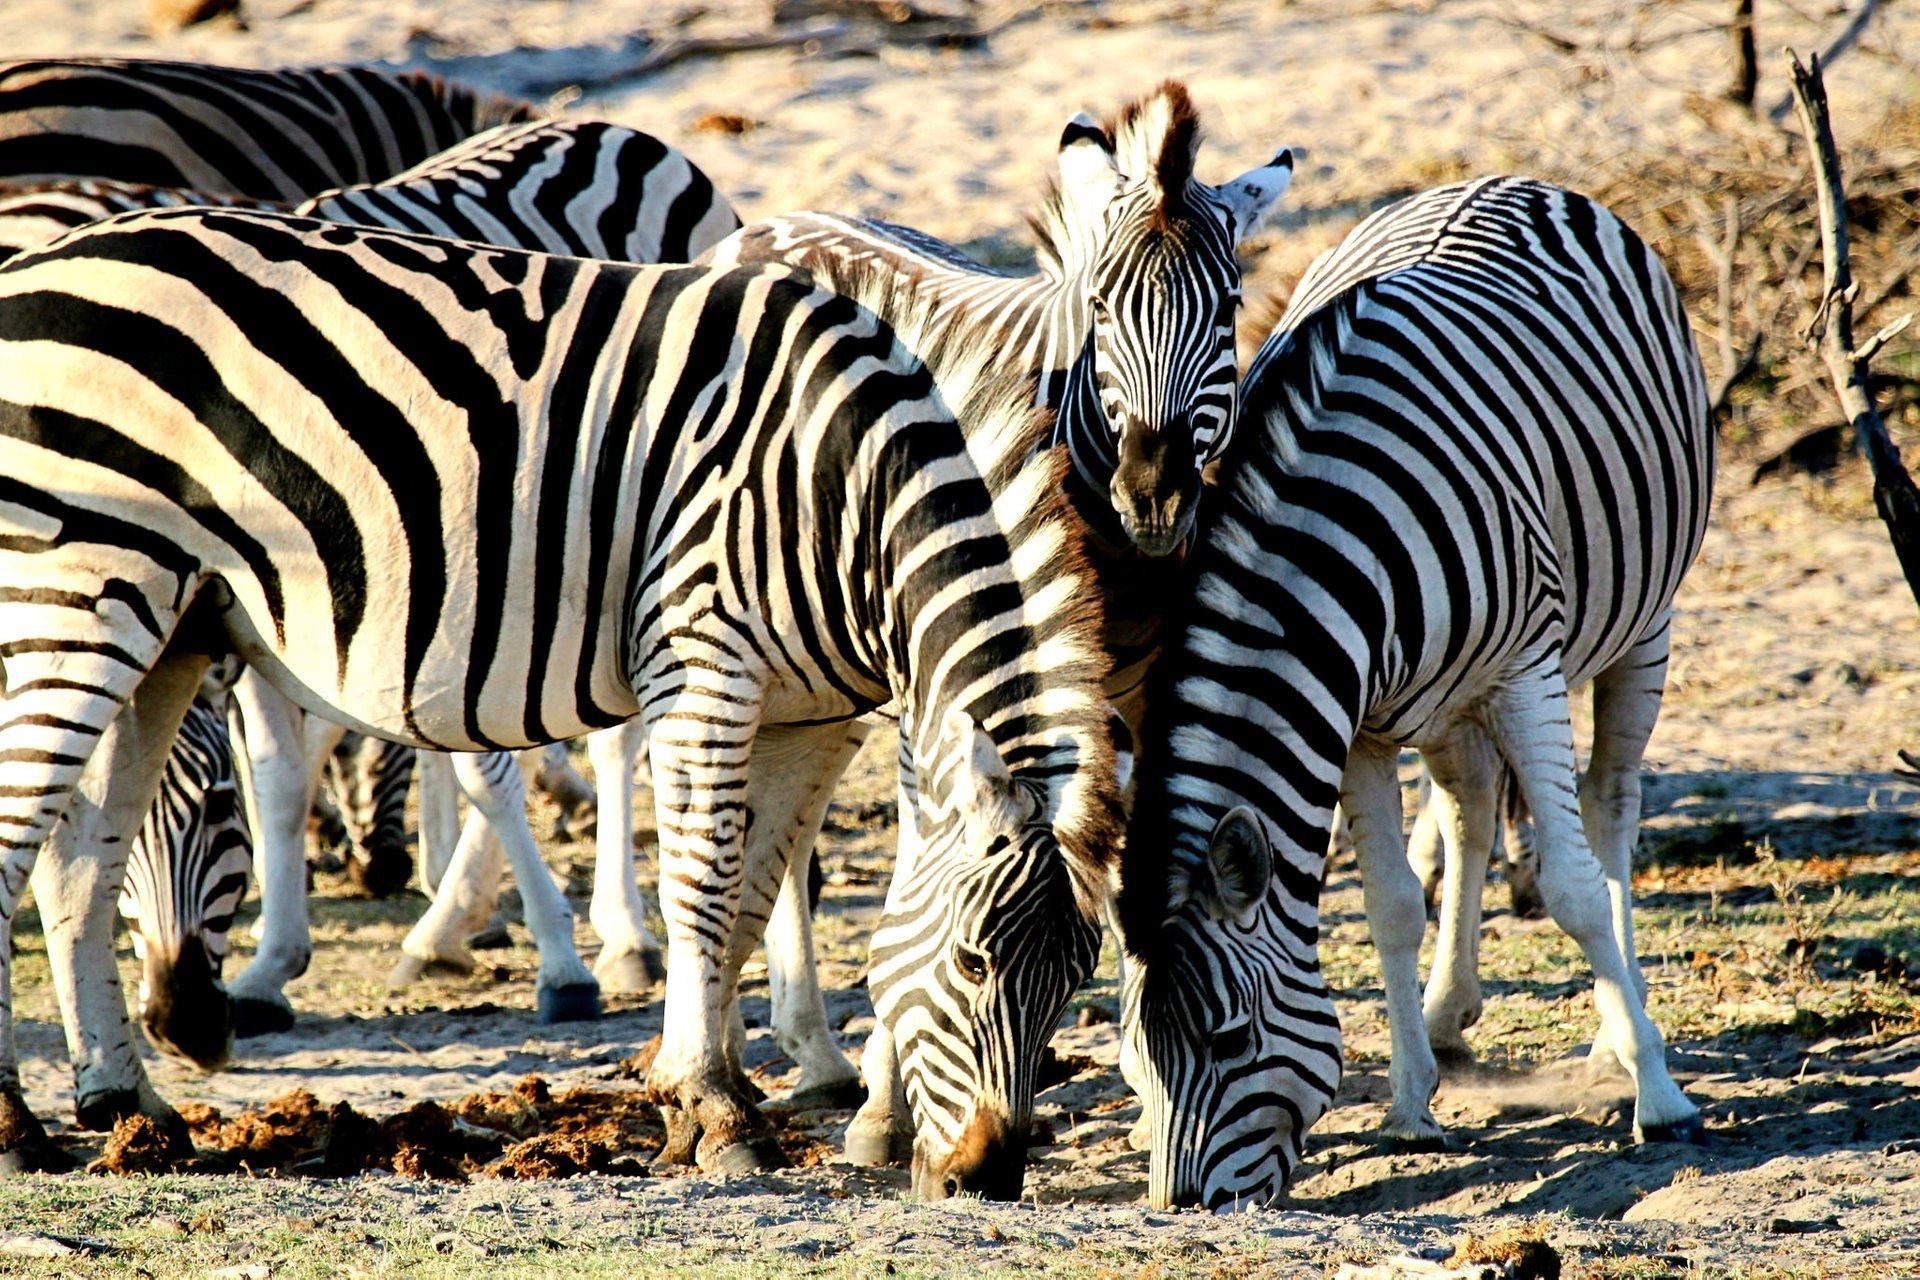 African Zebras in Botswana 2020 - Best Time